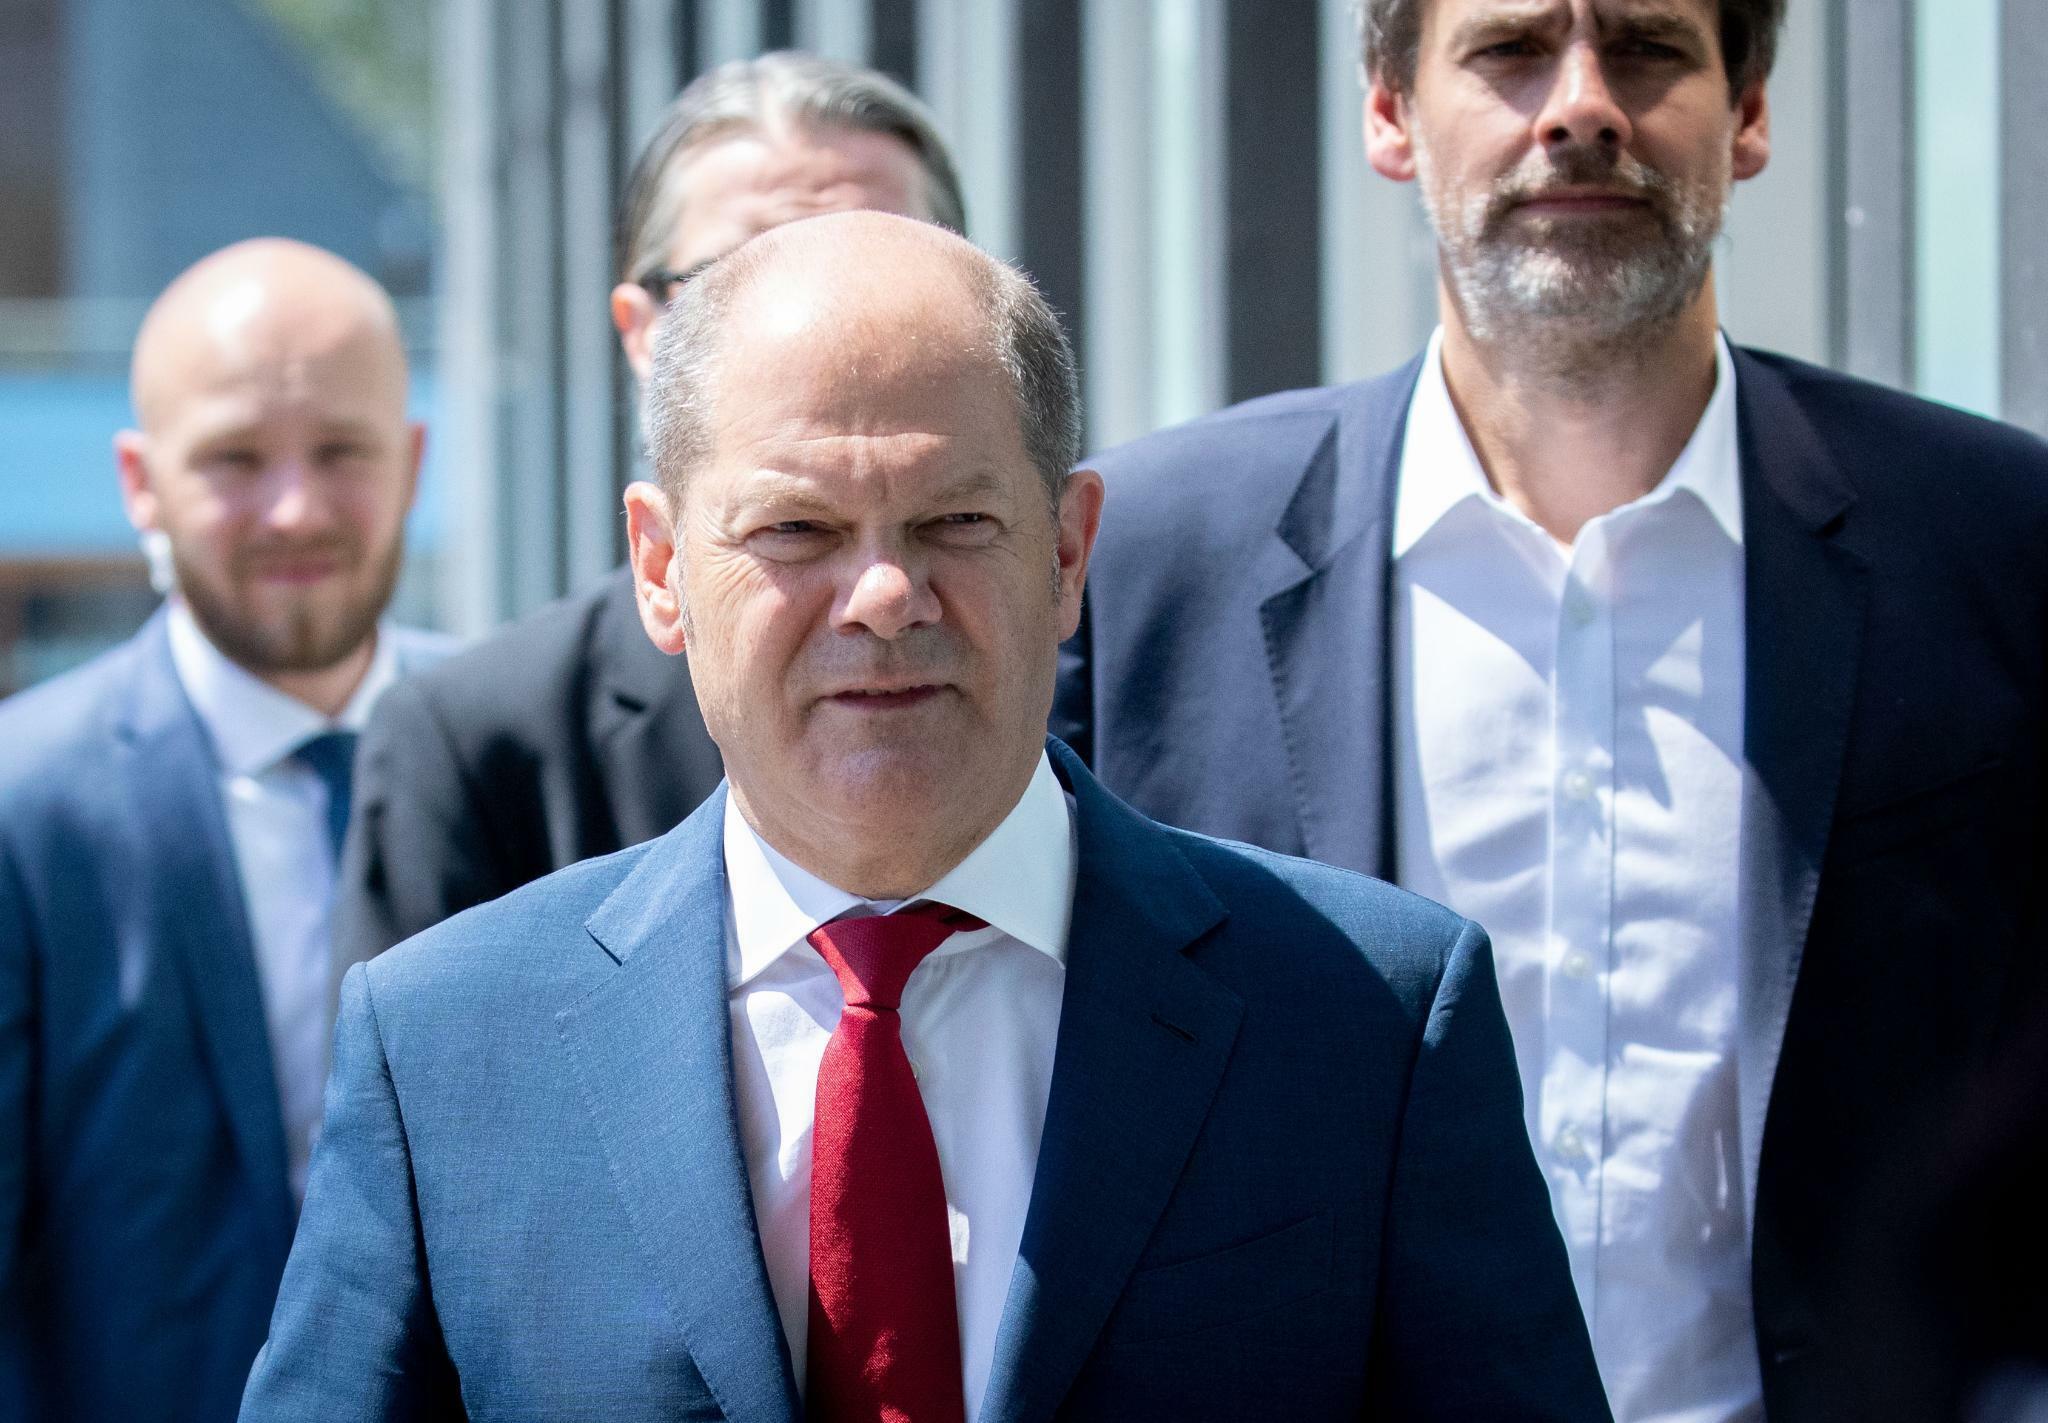 Olaf Scholz dementiert Kandidatur um SPD-Spitze nicht